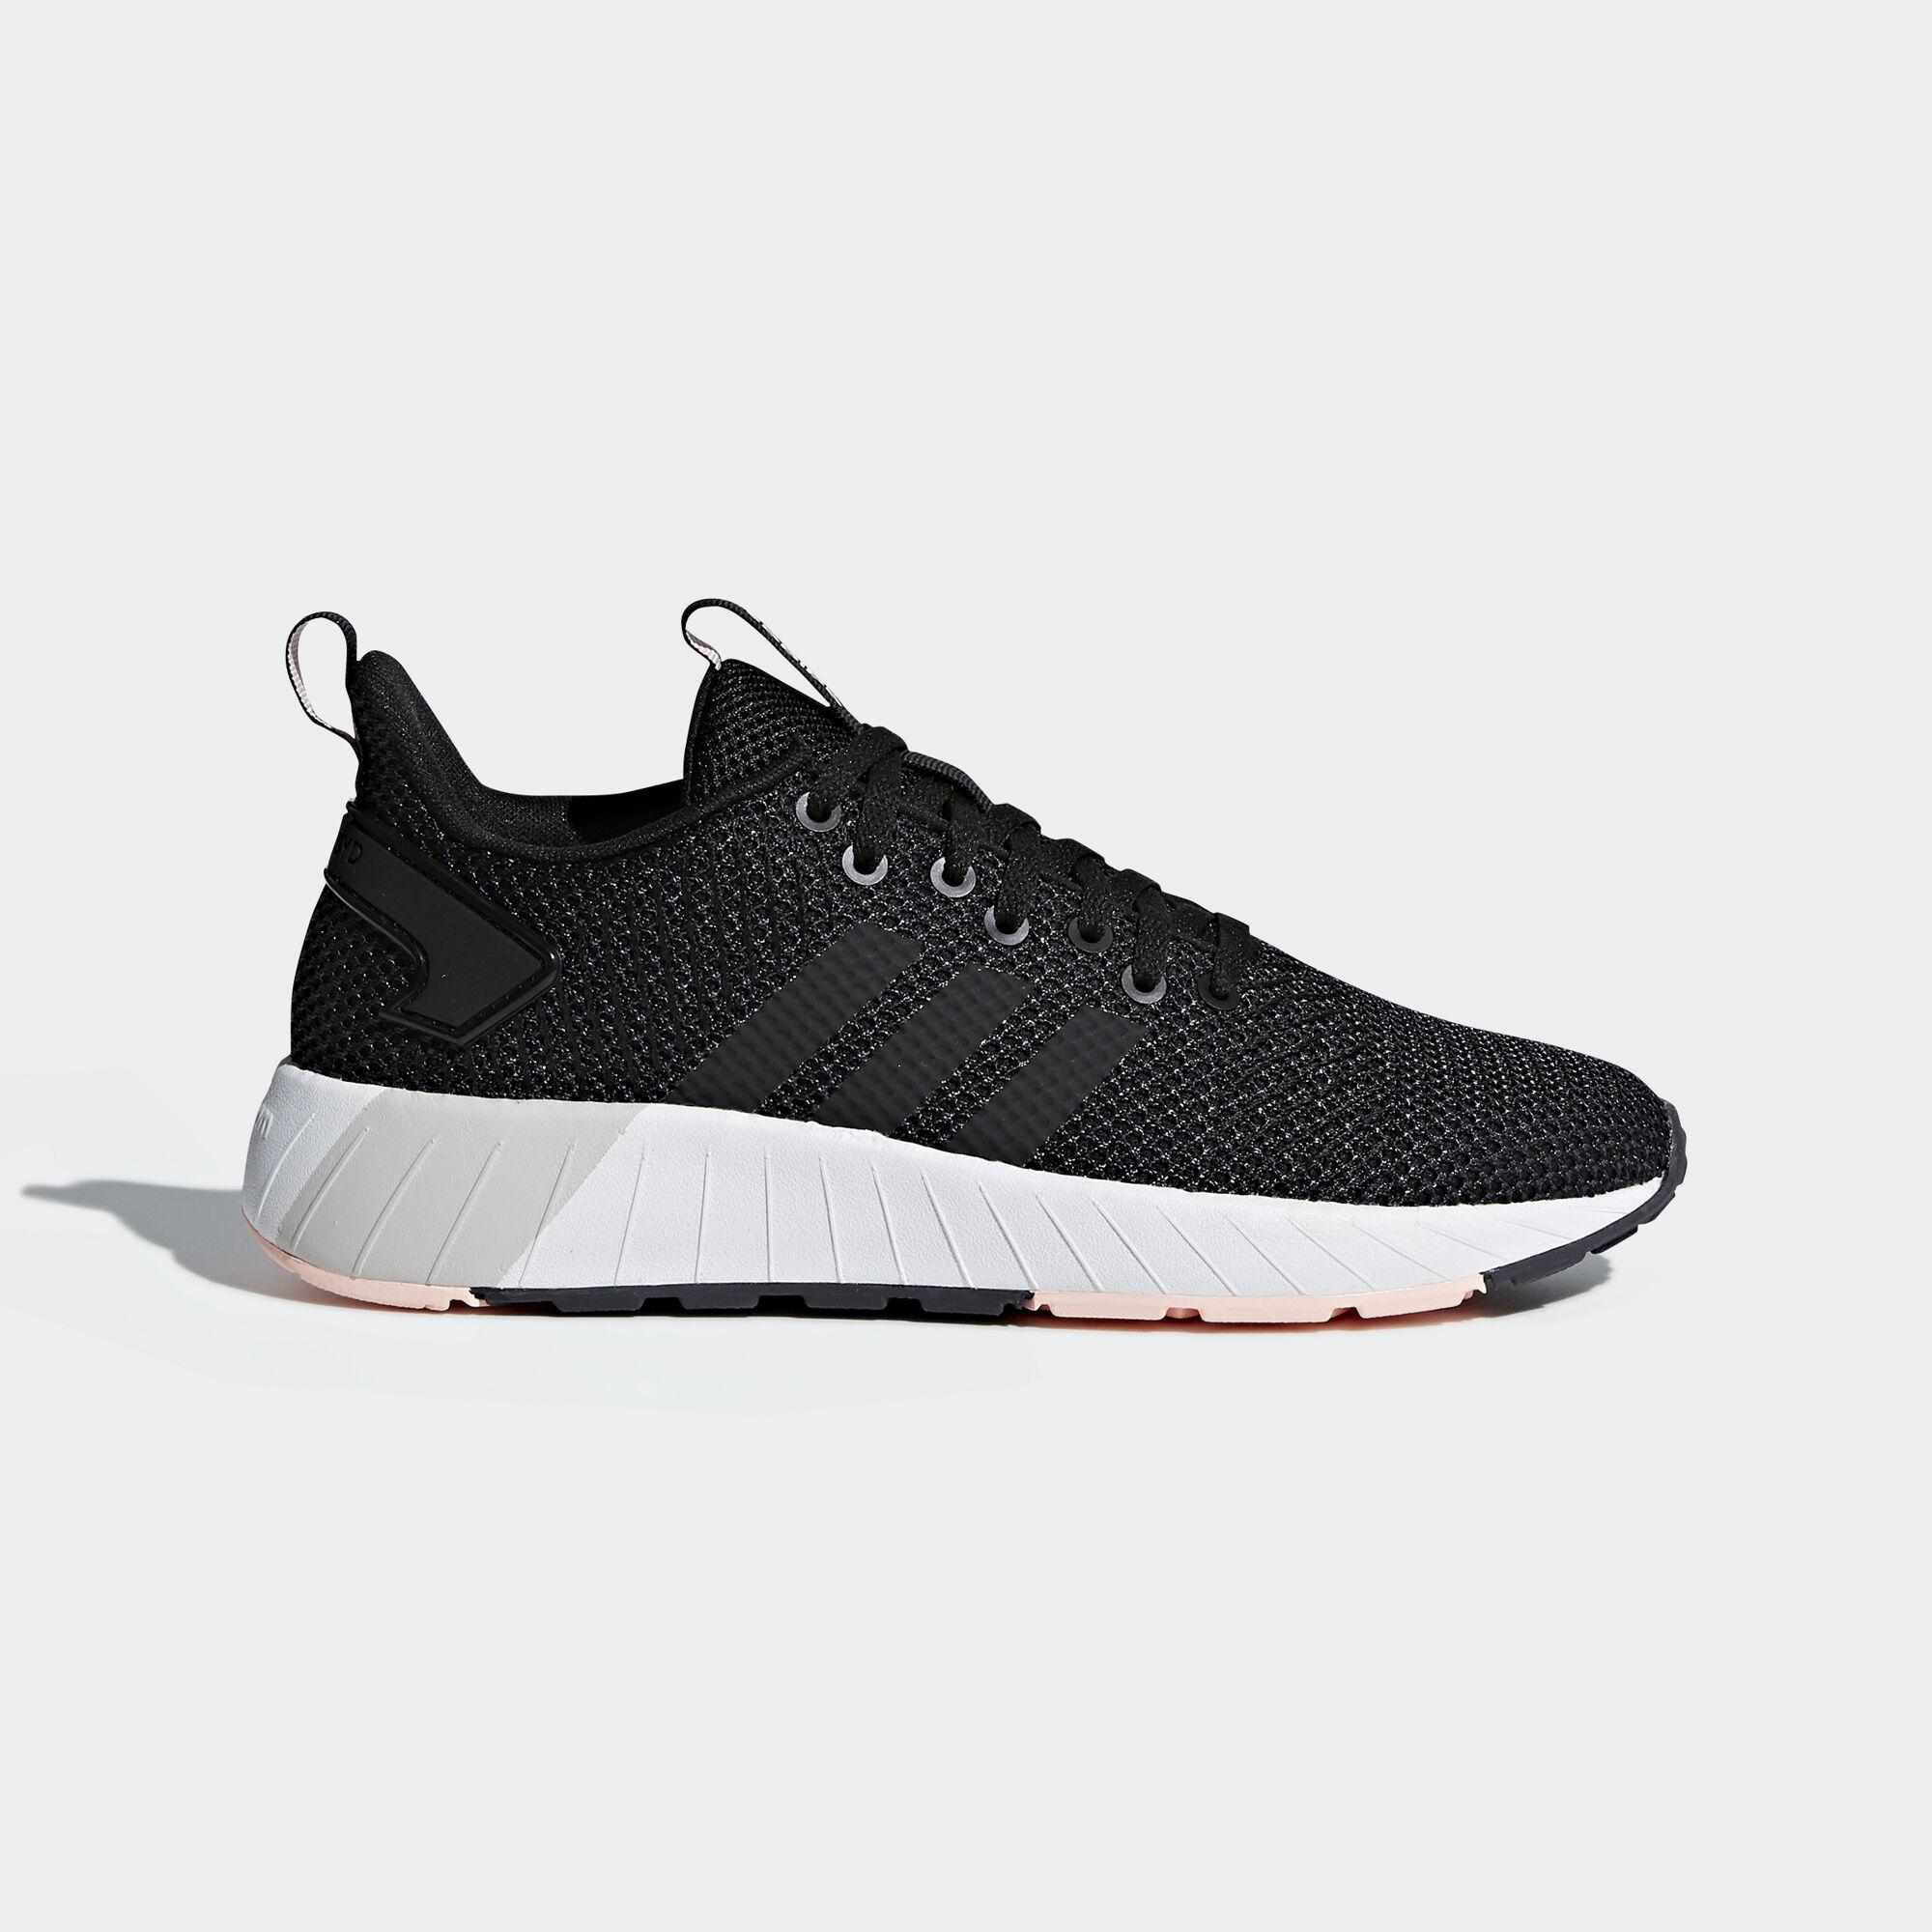 adidas - Questar BYD Shoes Core Black/Core Black/Haze Coral DB1691